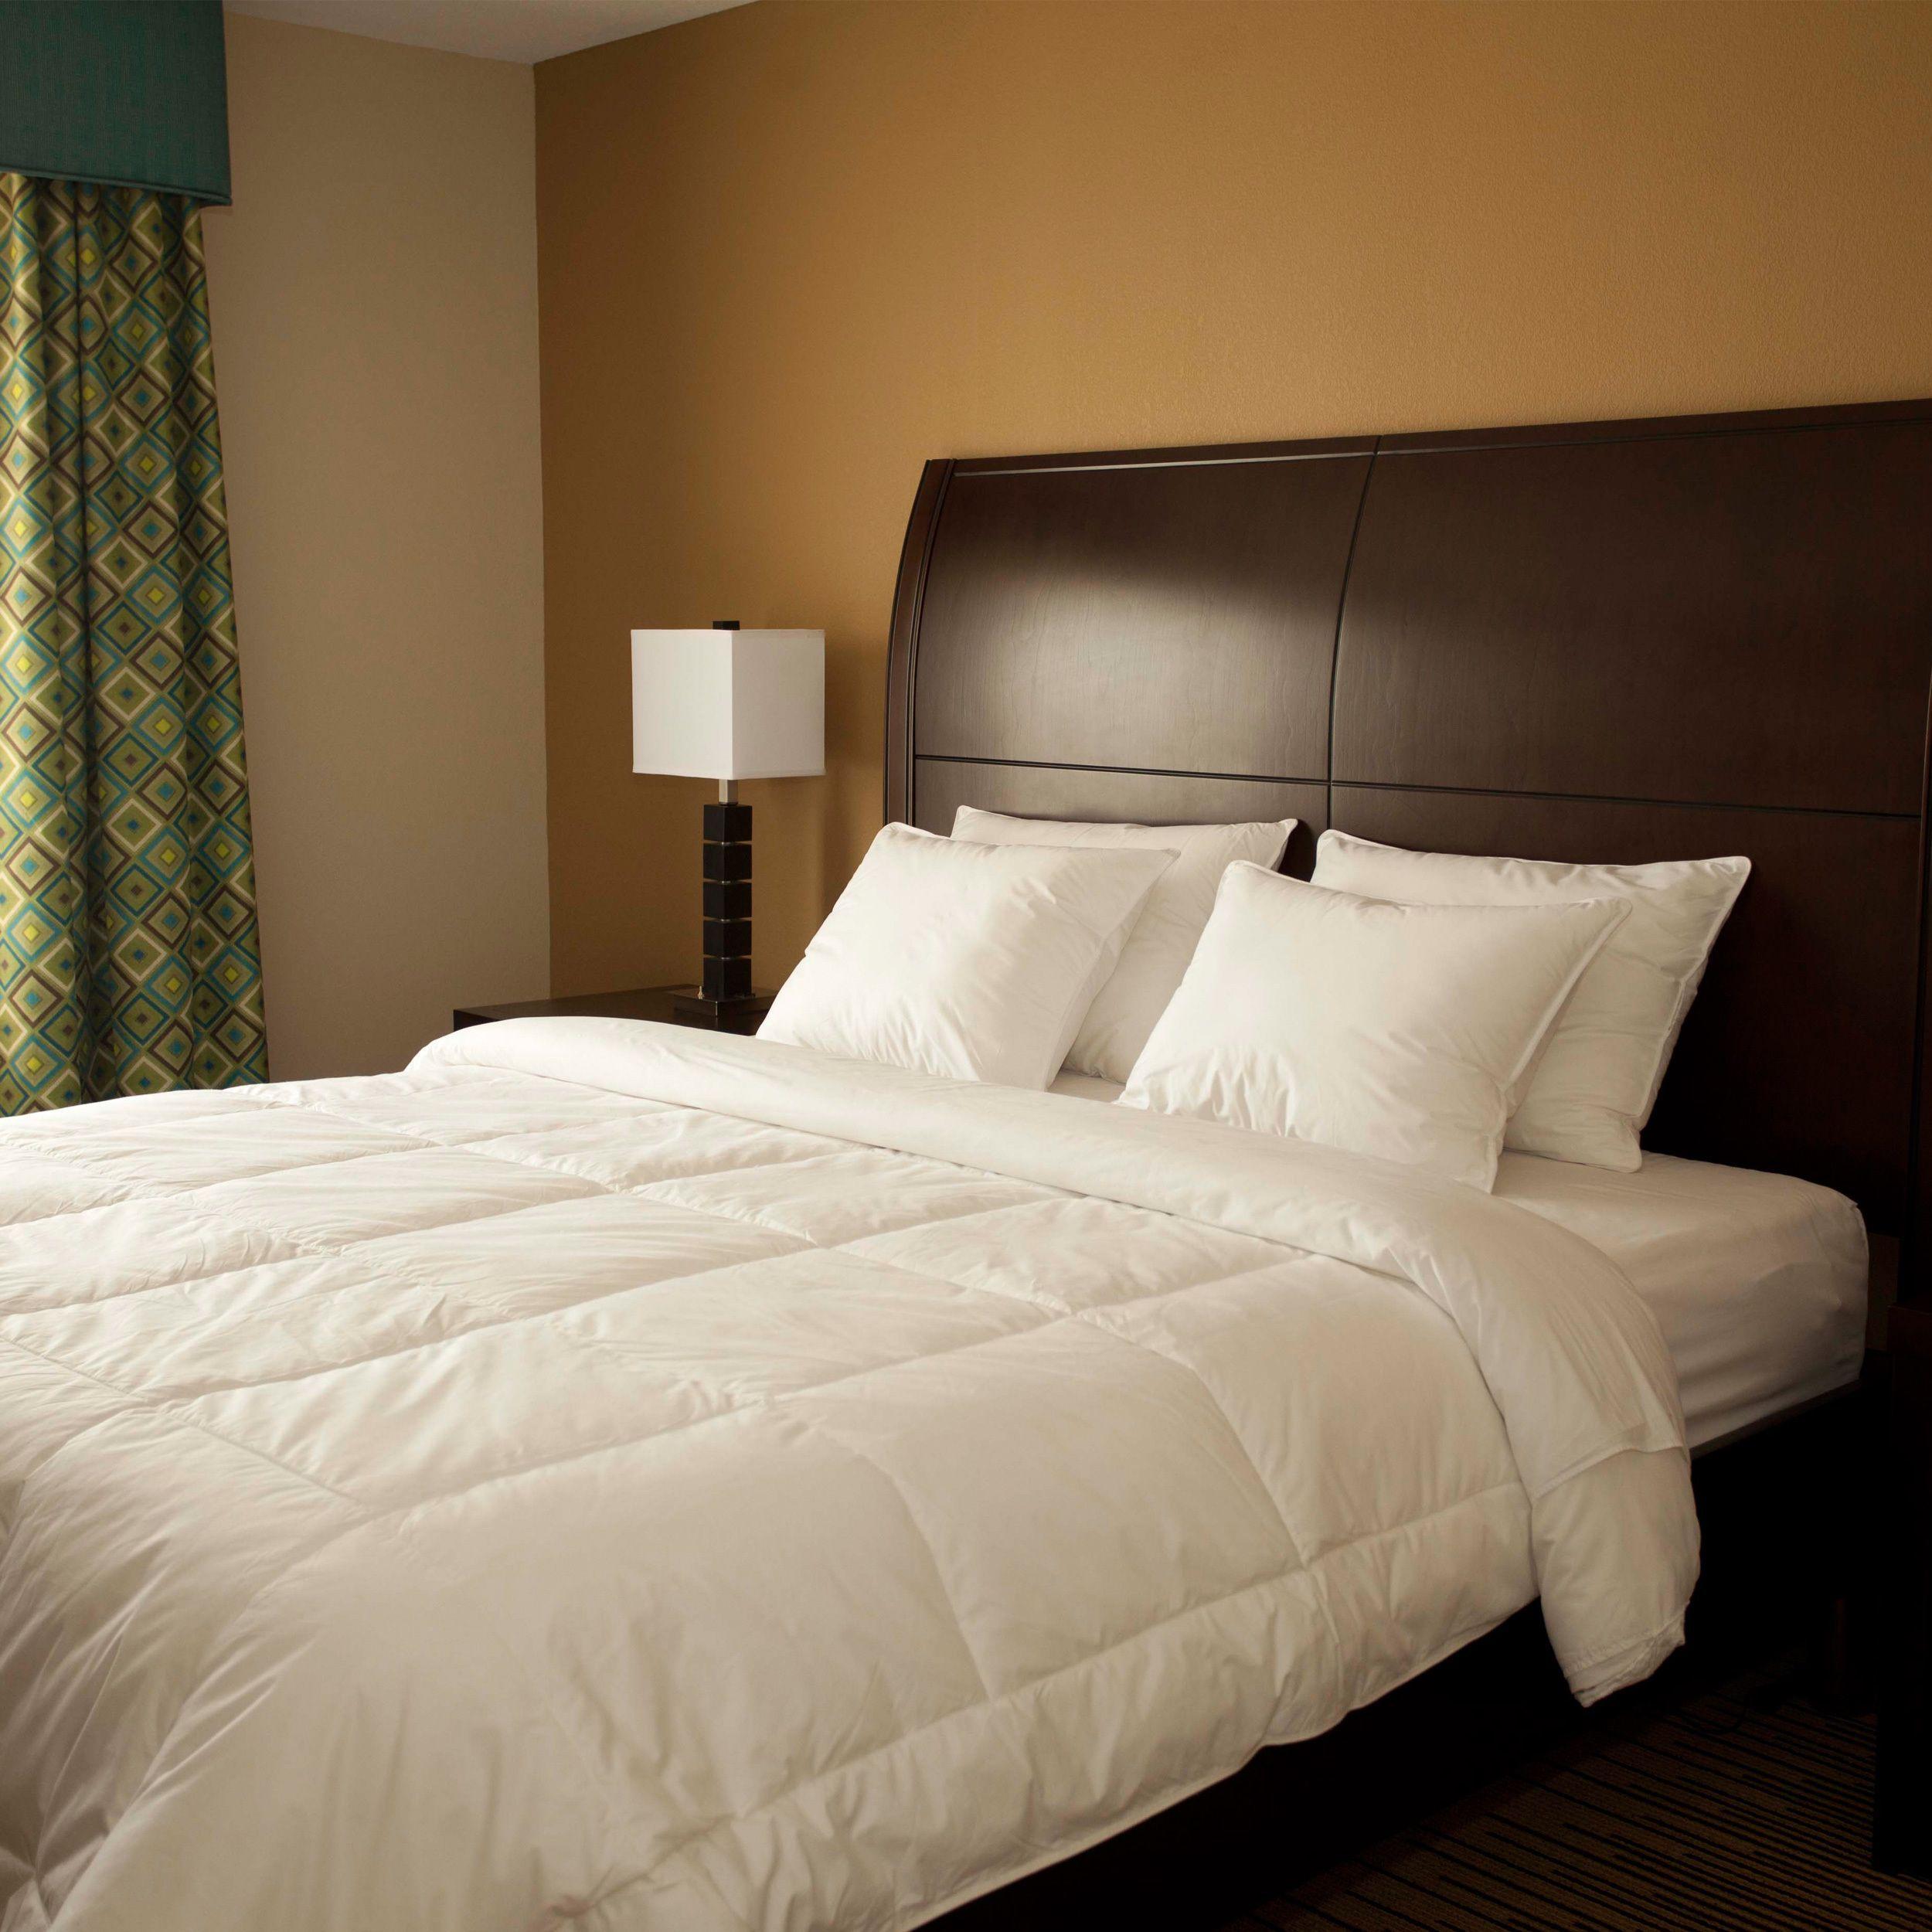 goose comforter duvet king sale bed down warmest grey california blue purple alternative navy l collection comforters black comforterf hotel oversized twin insert